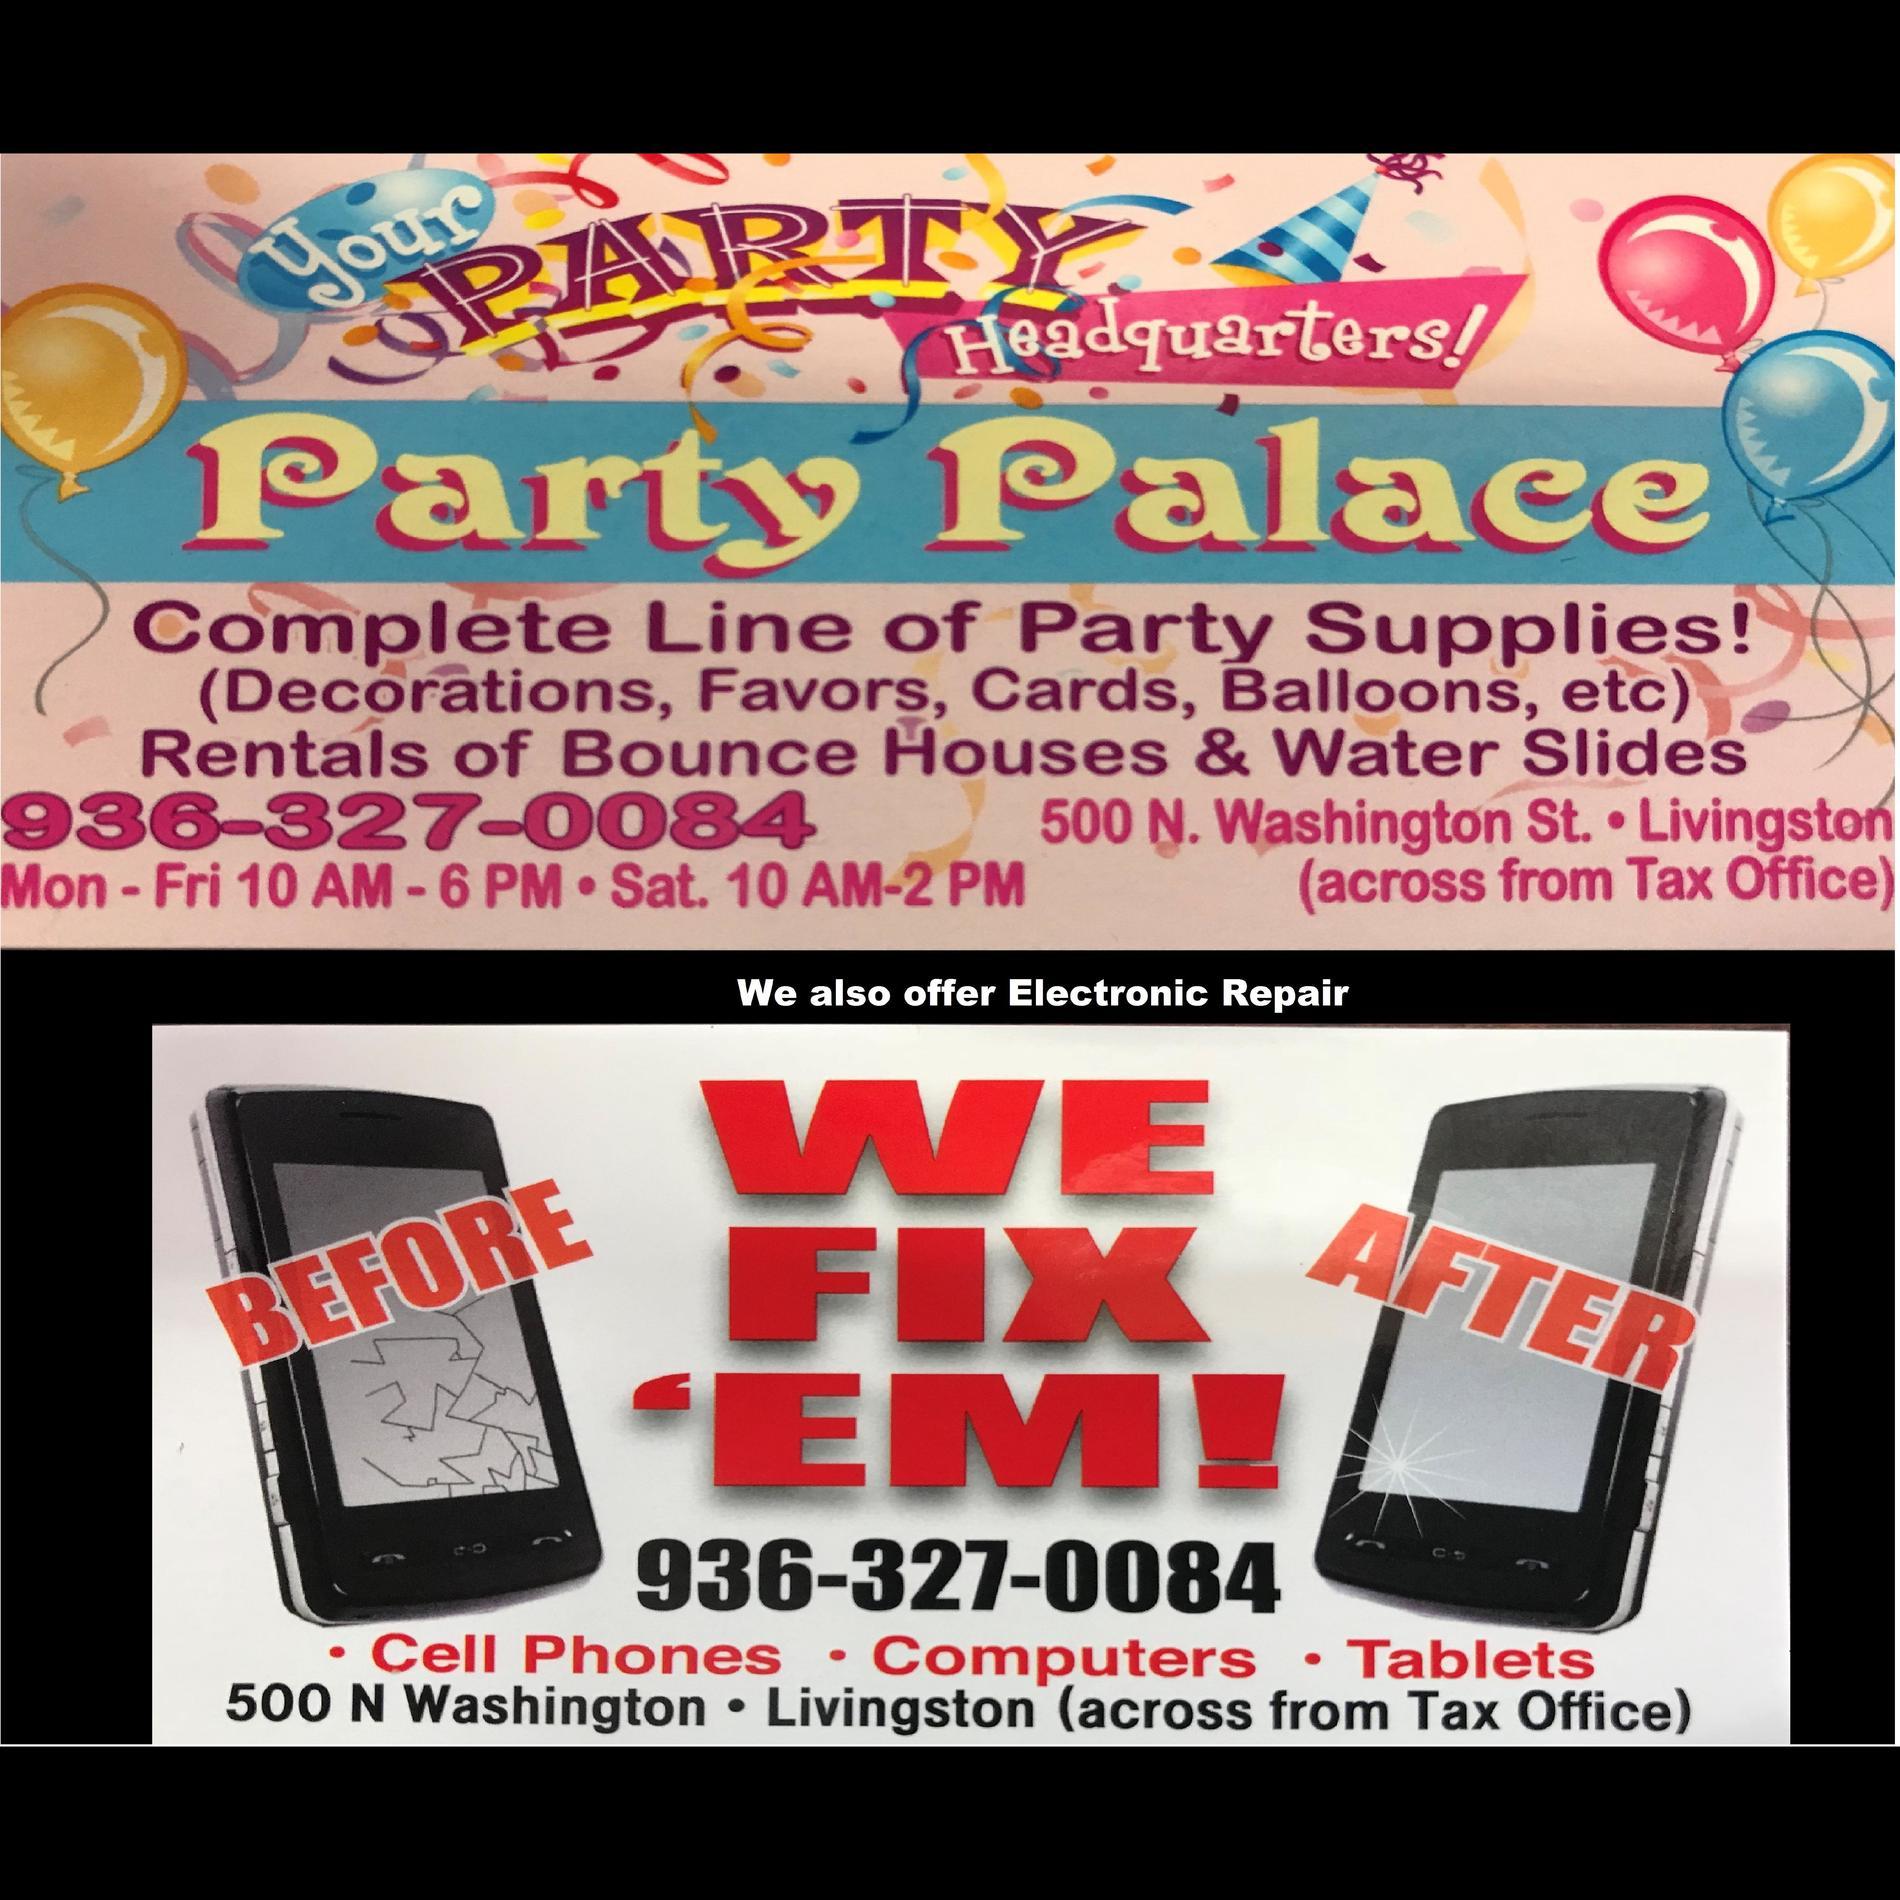 Party Palace LLC